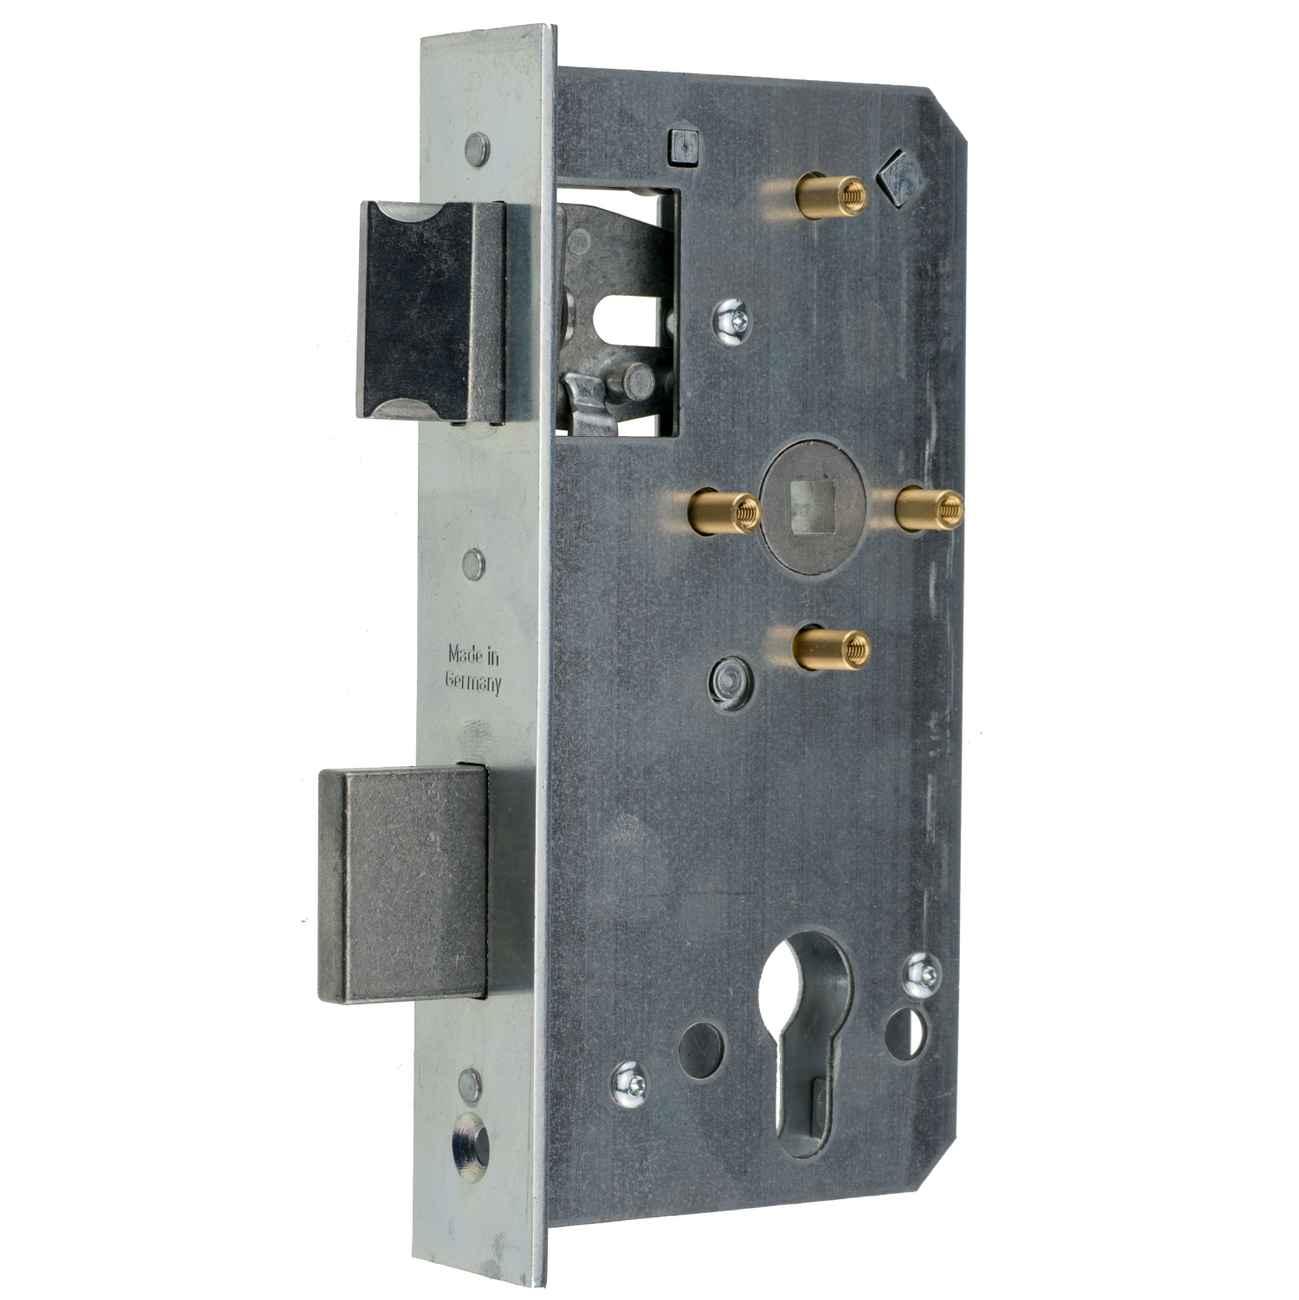 Ersatz-Metalltorschloss mit Stulpe 33x179 mm für 40mm Schlosskästen, Dornmaß 55 Entfernung 72, 4 Messinghülsen